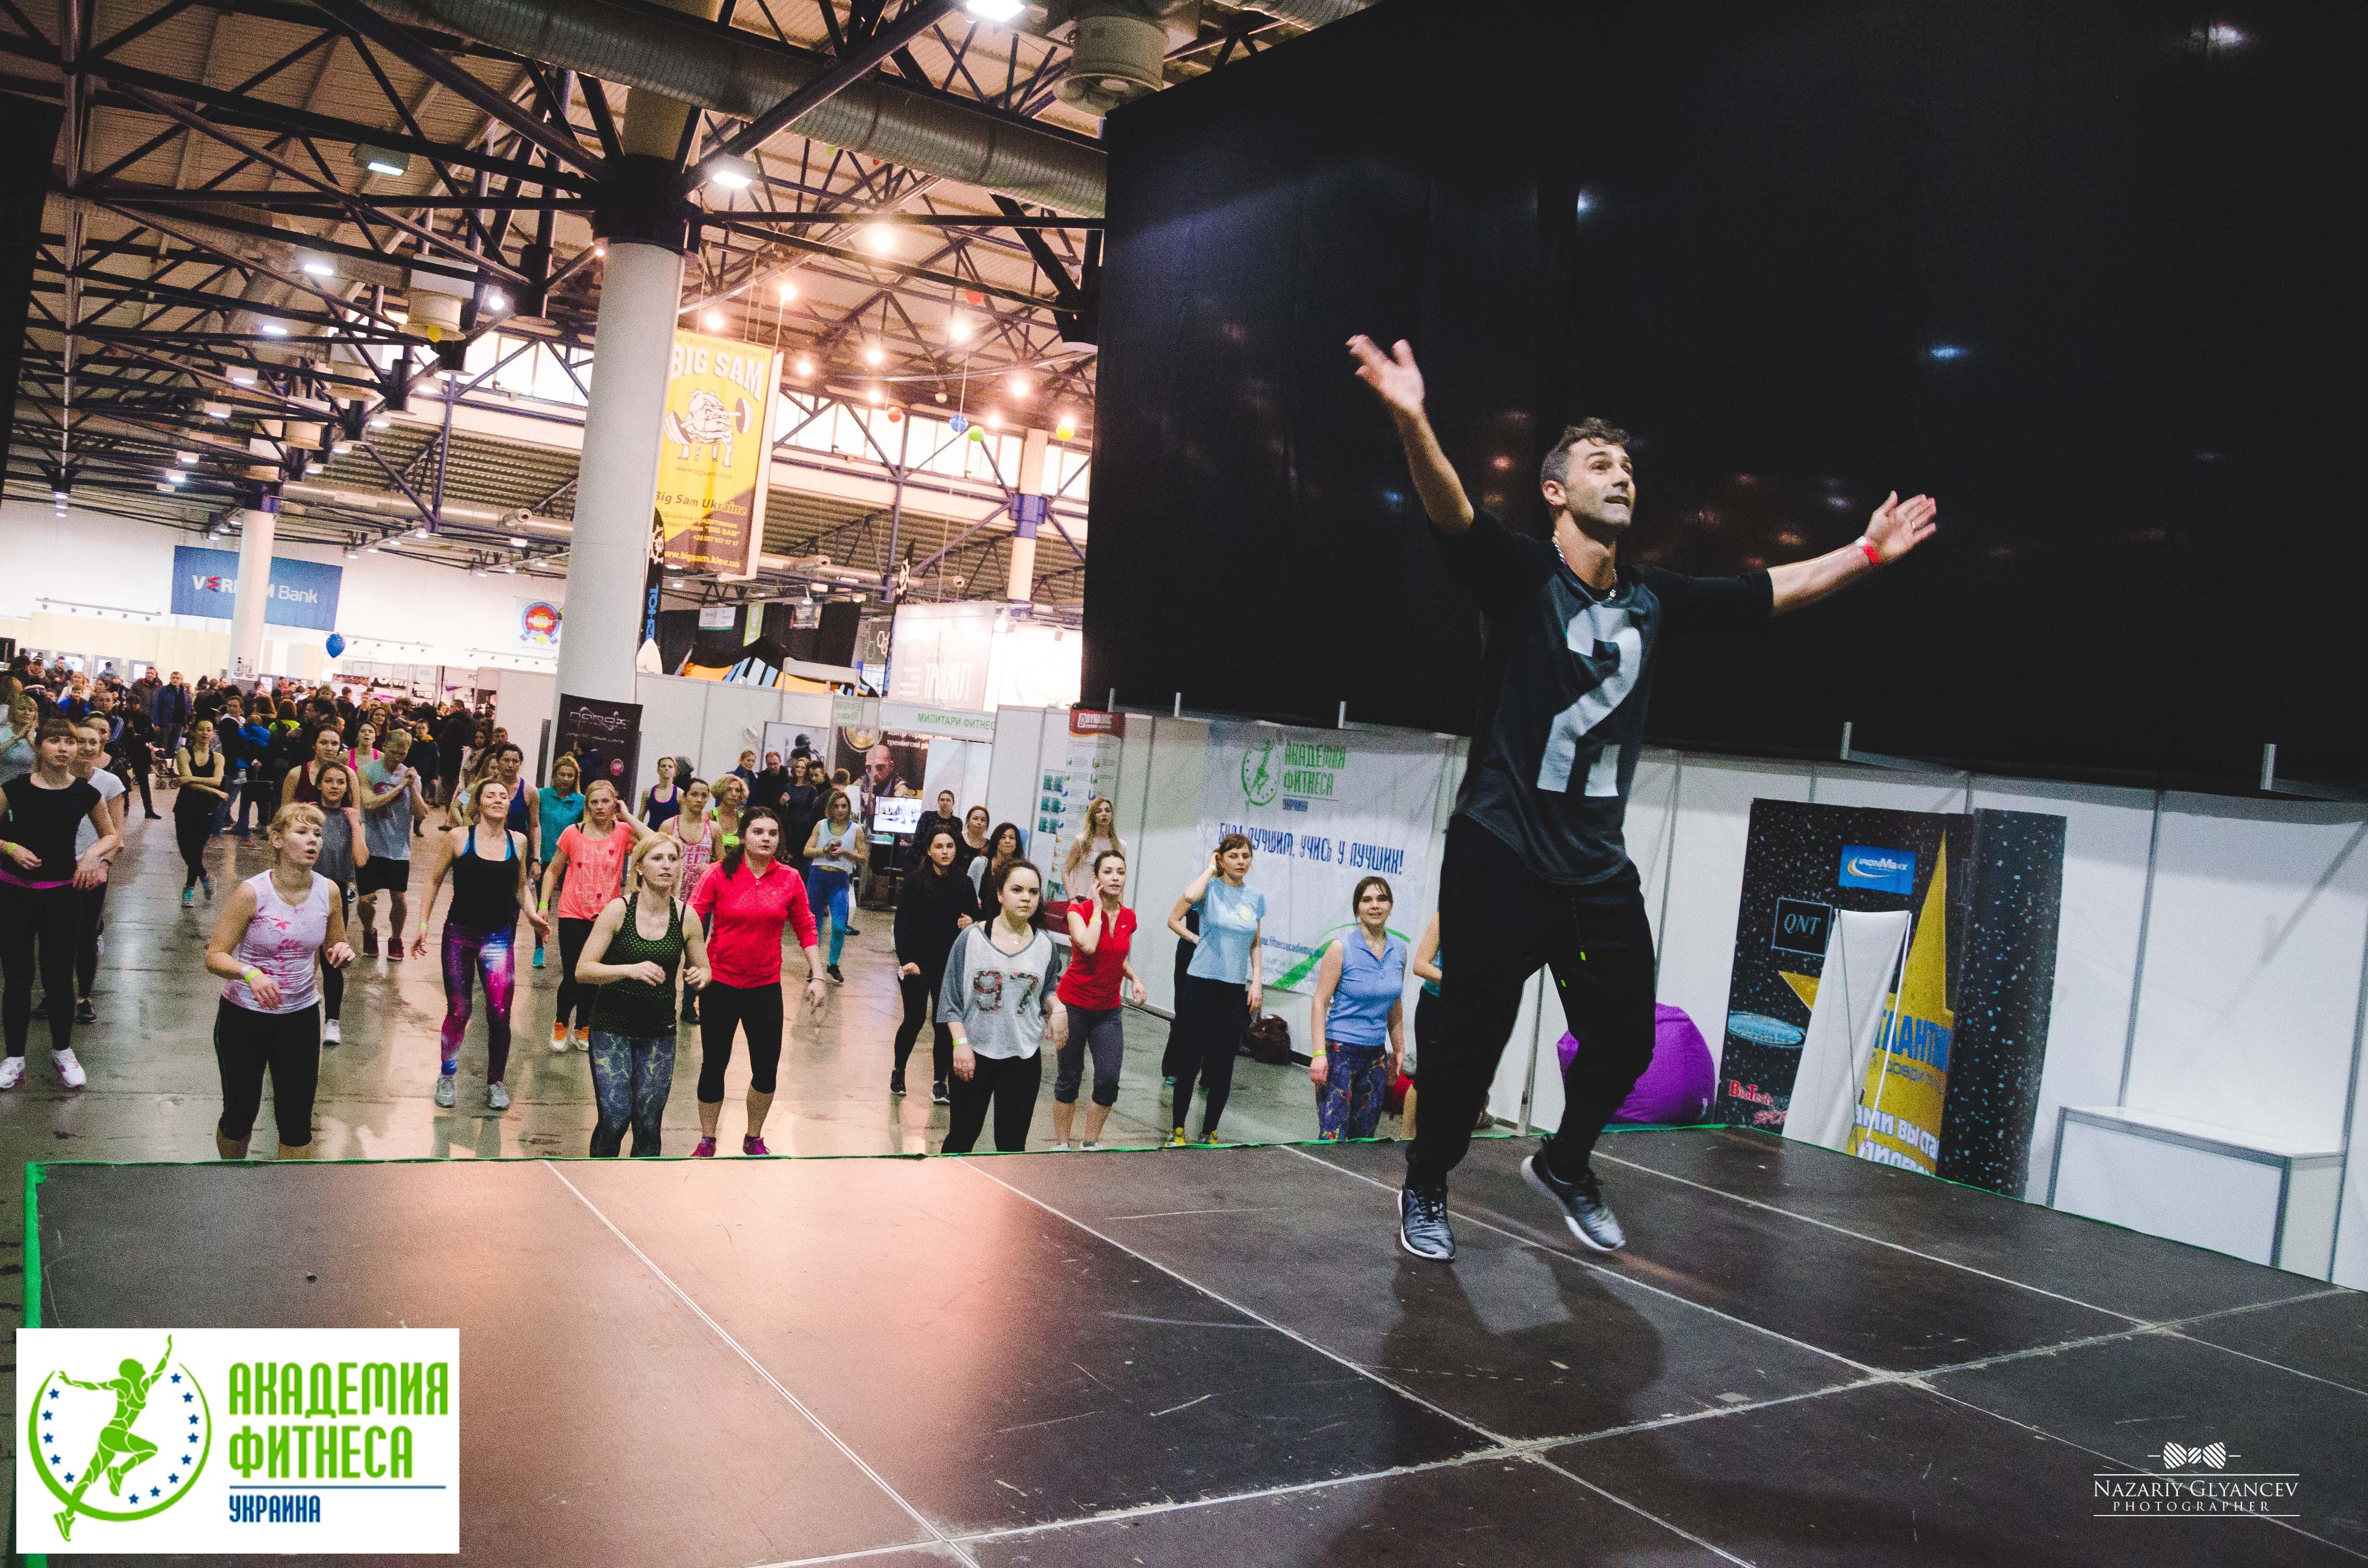 https://profit.fitnessacademy.com.ua/wp-content/uploads/2018/10/109-1-iz-1.jpg